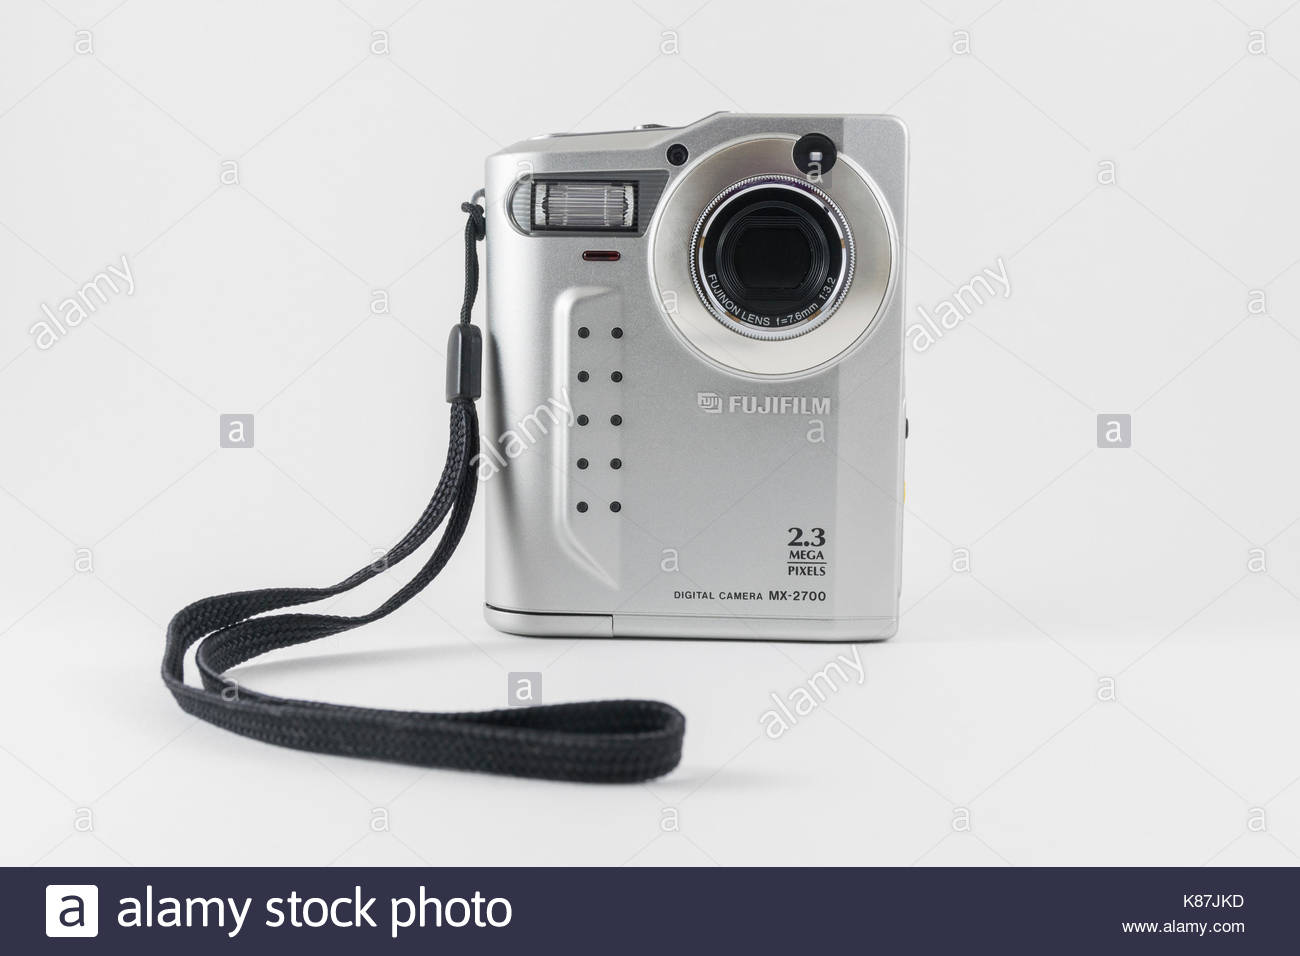 Fujifilm MX 2700 digital camera, 2.3 Megapixels - Stock Image